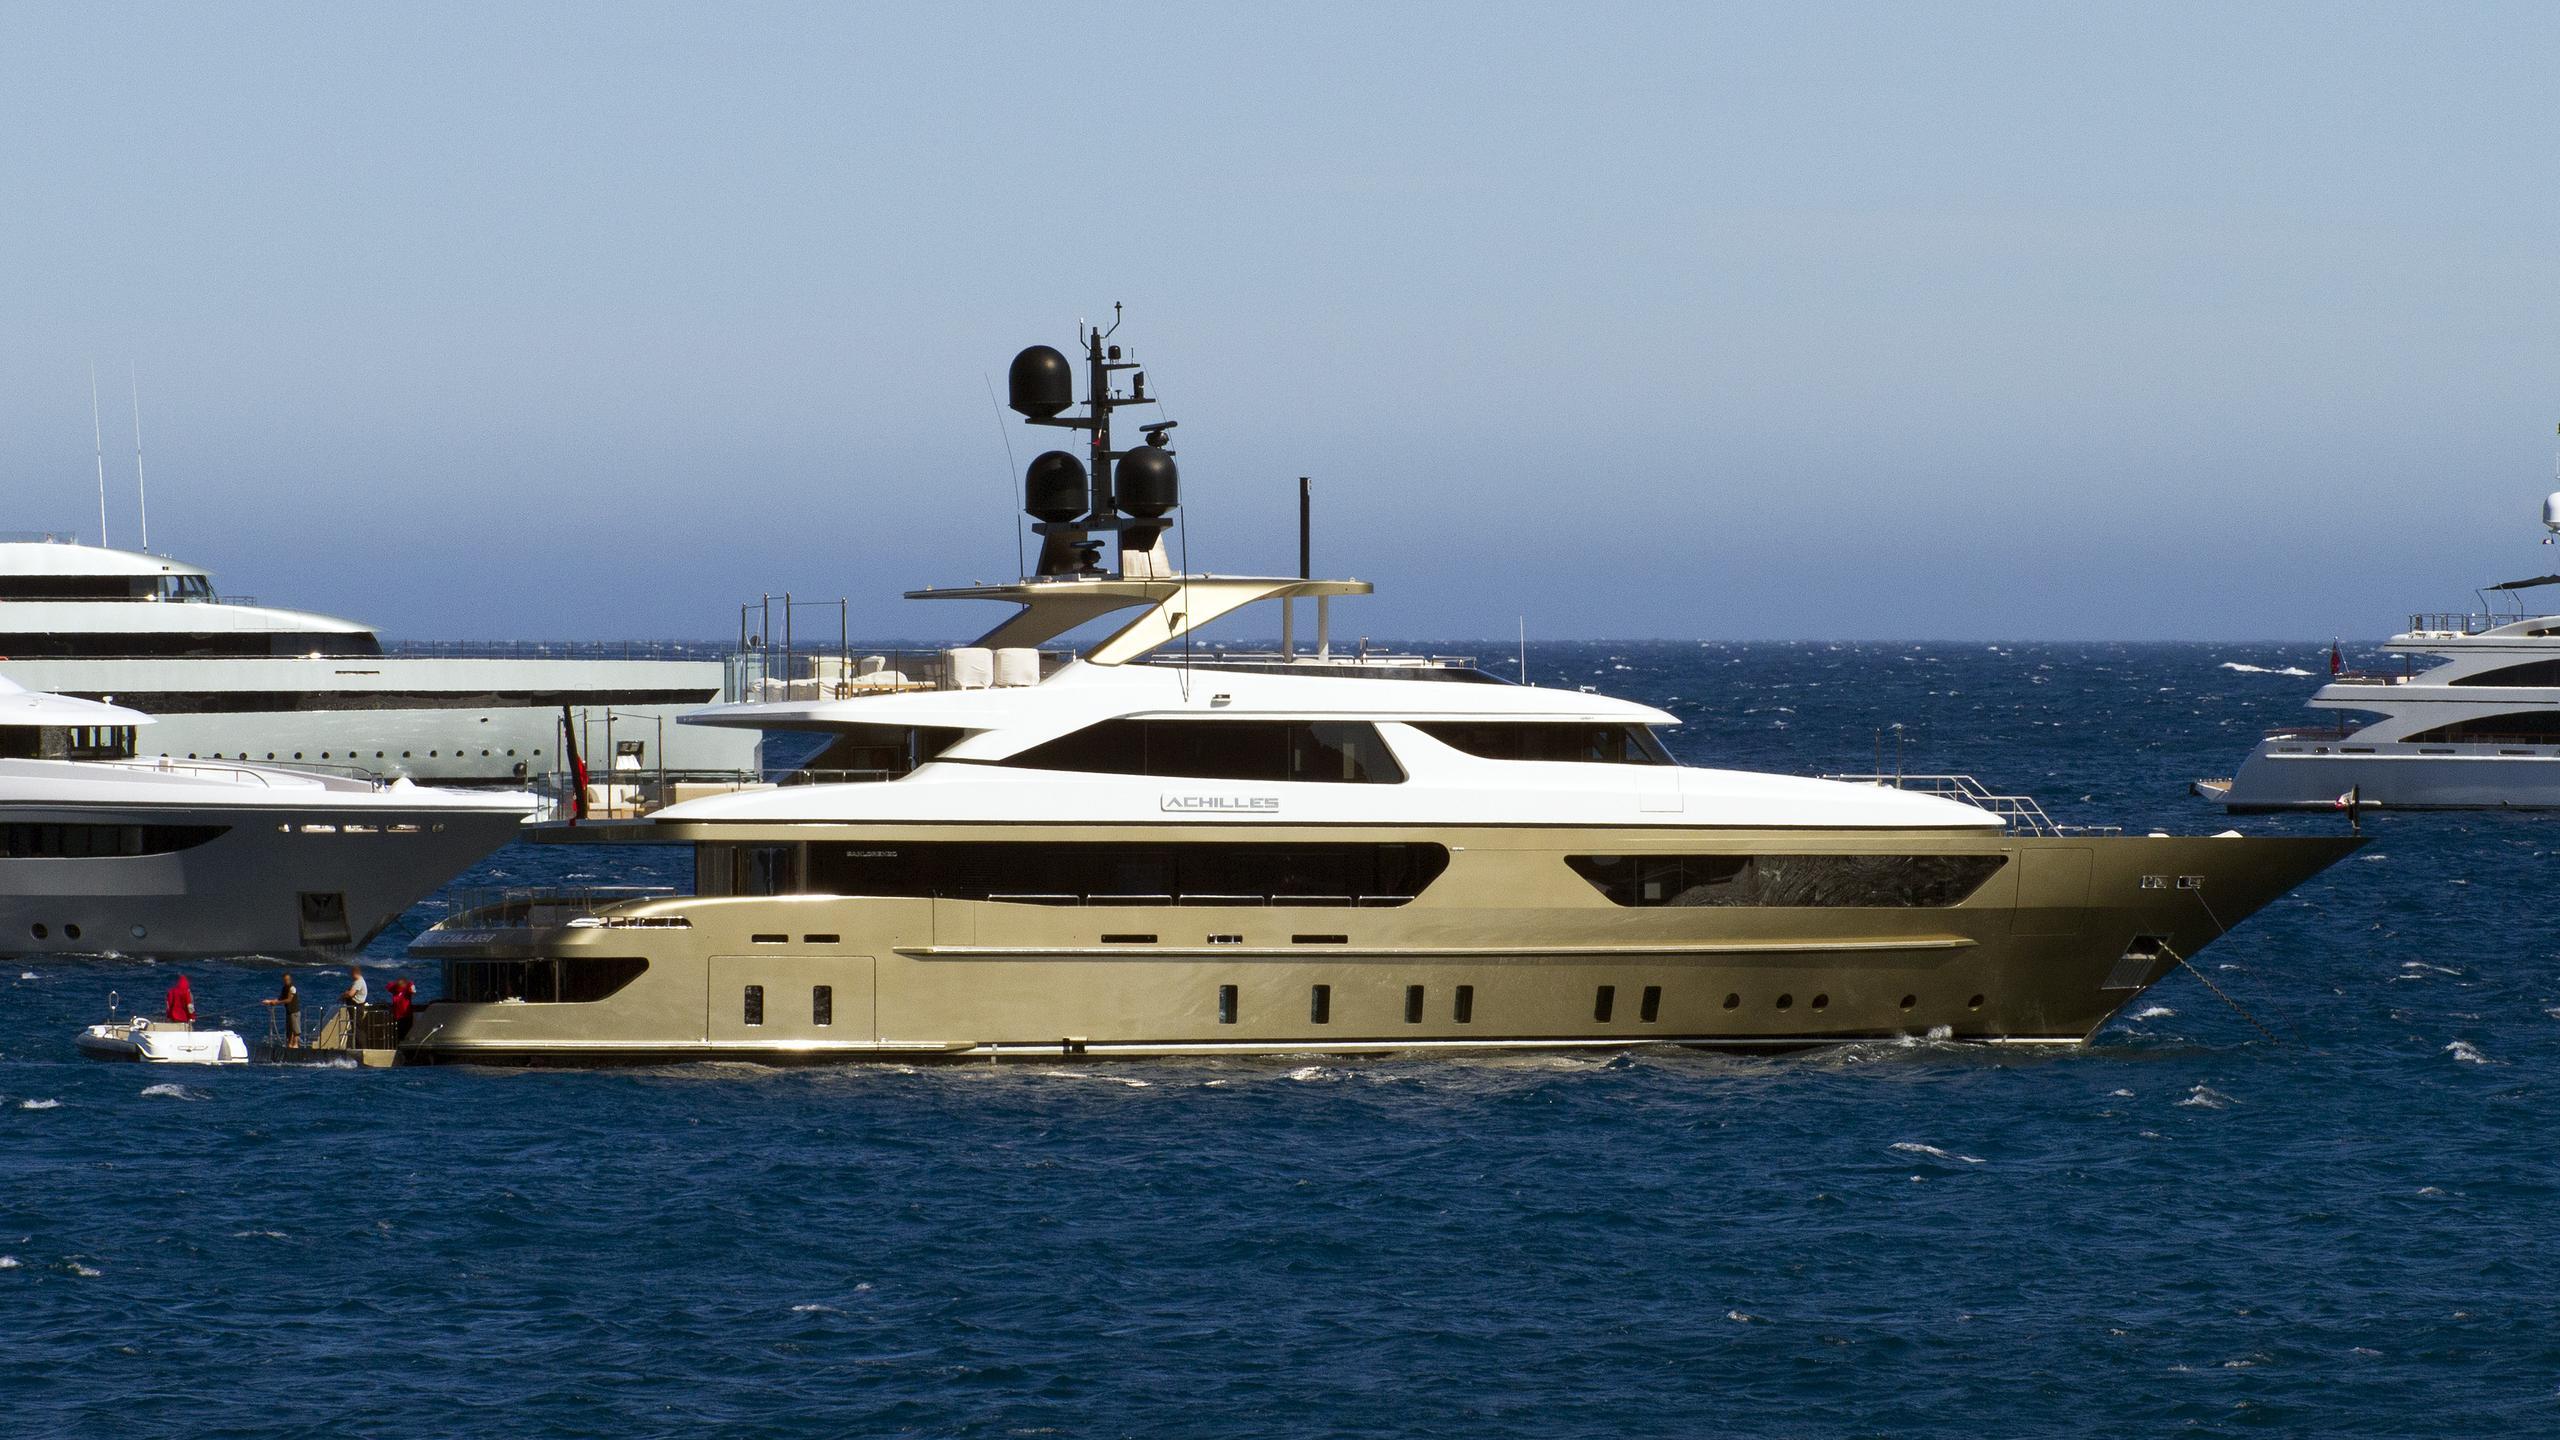 apries-w-achilles-f-motor-yacht-sanlorenzo-2012-46m-profile